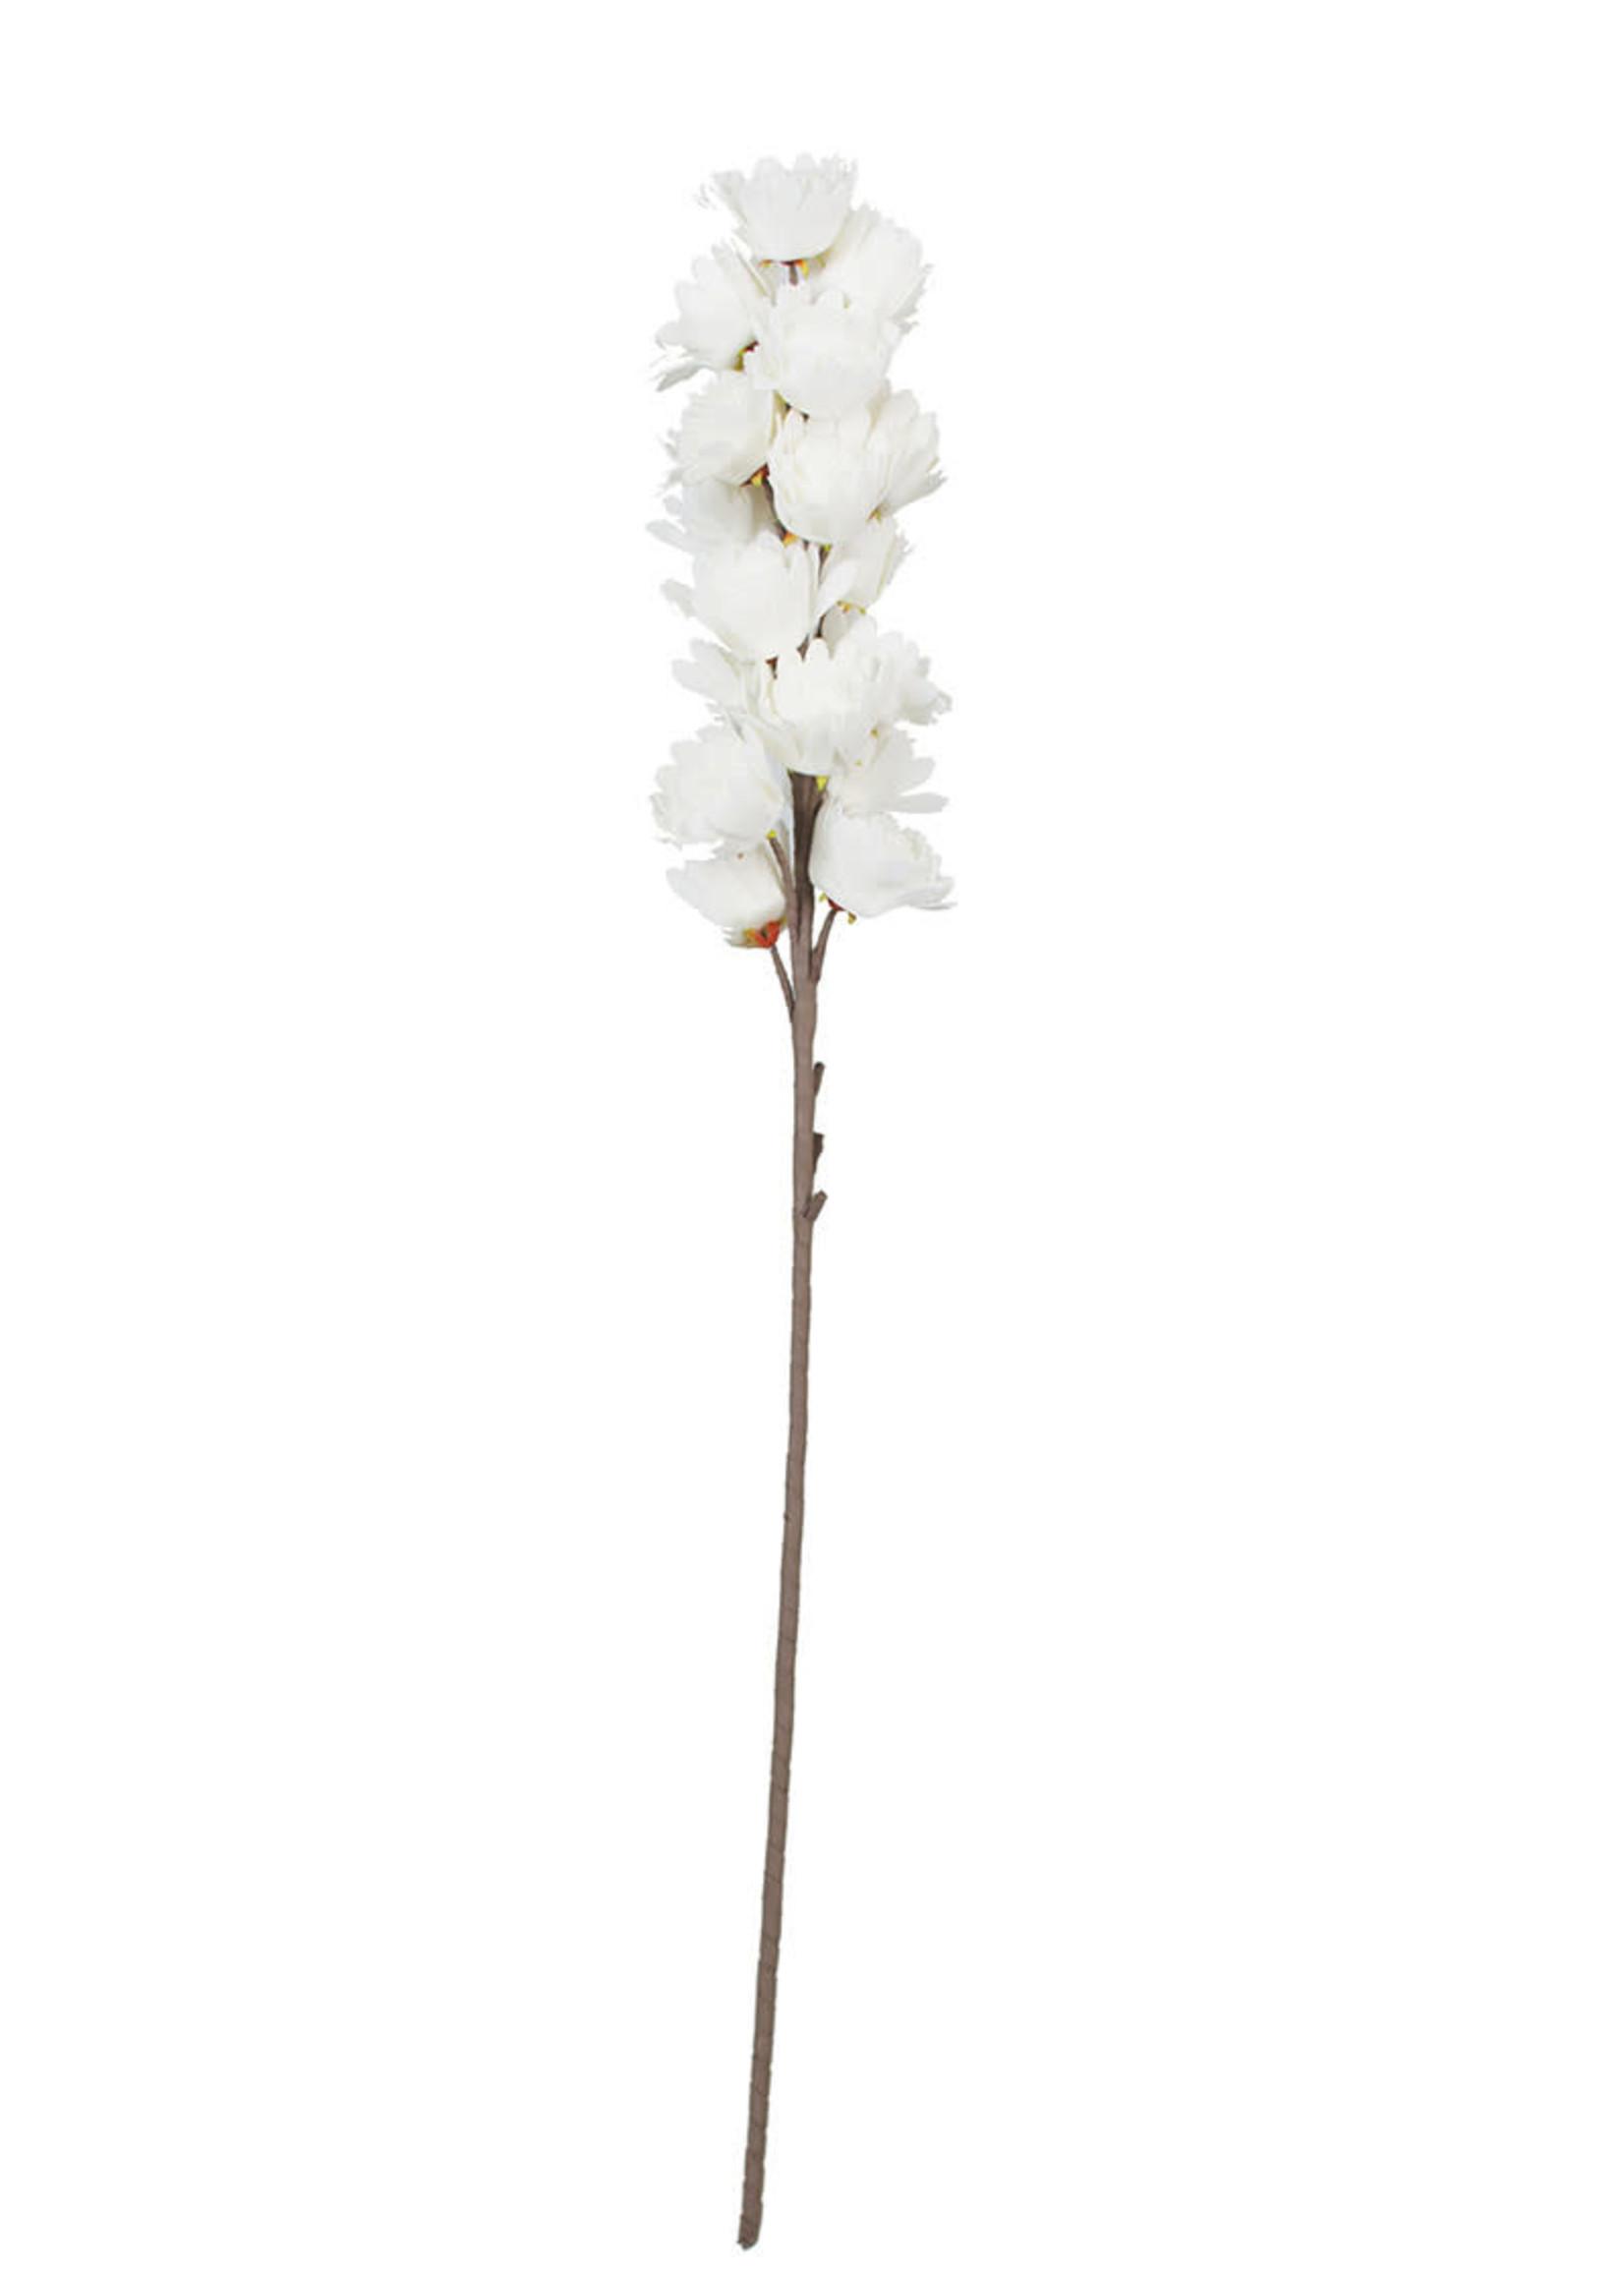 Botanica #3104